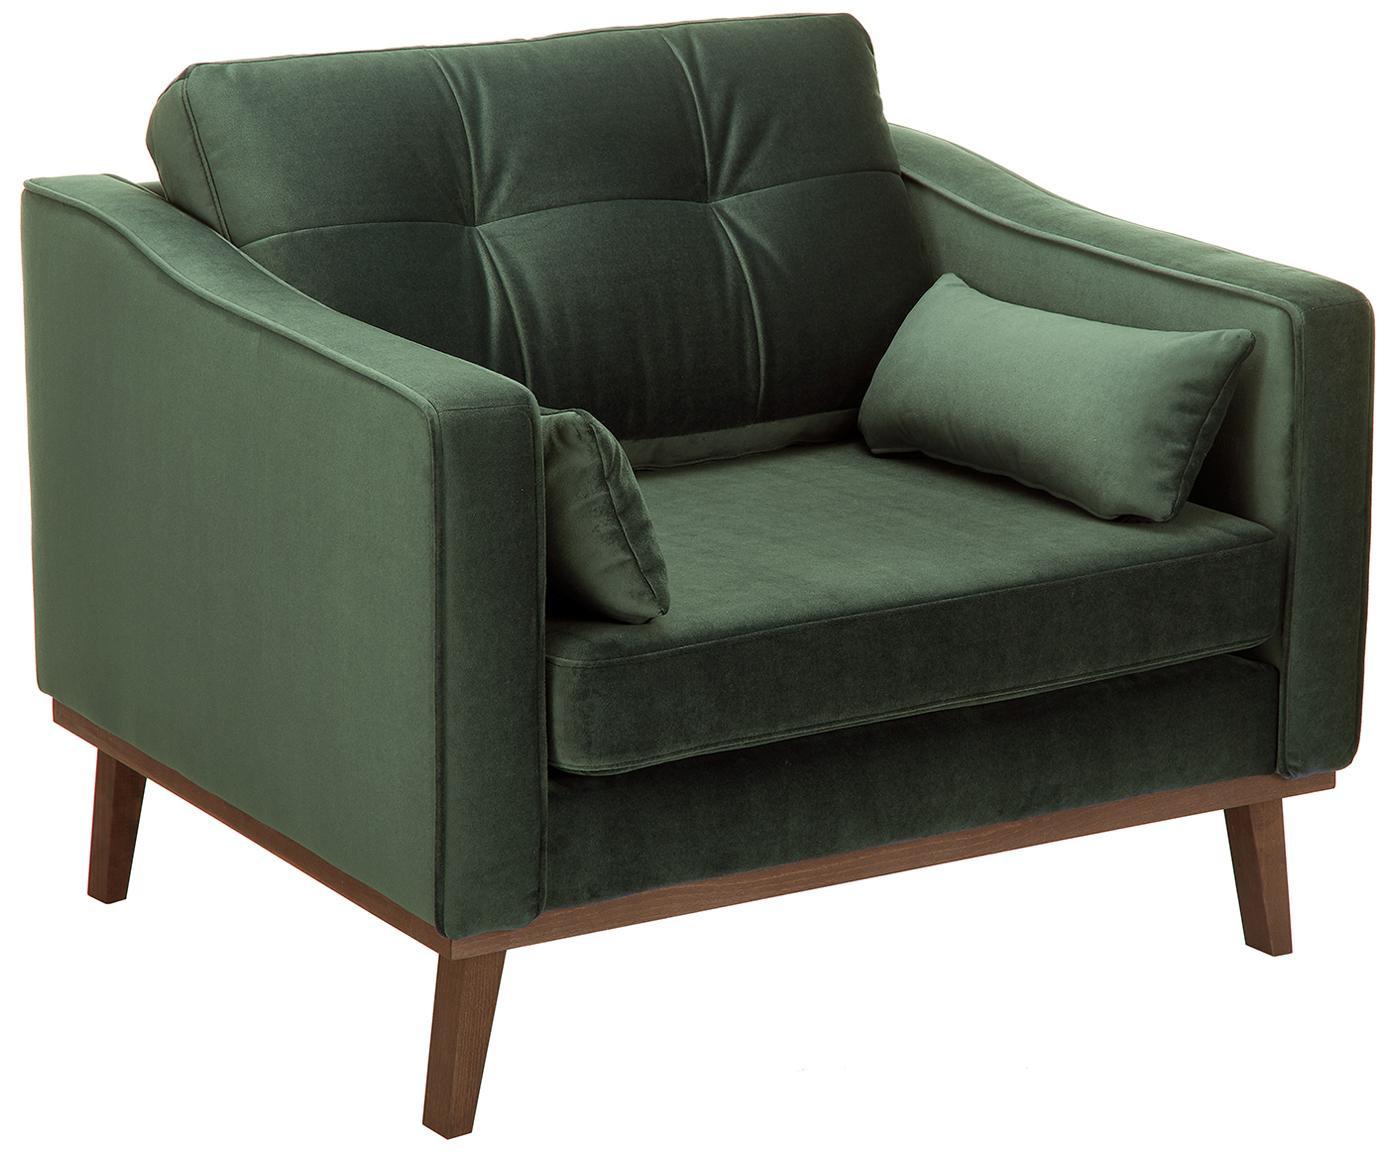 Klassischer Samt-Sessel Alva in Oliv, Bezug: Samt (Hochwertiger Polyes, Gestell: Massives Kiefernholz, Samt Oliv, B 102 x T 92 cm